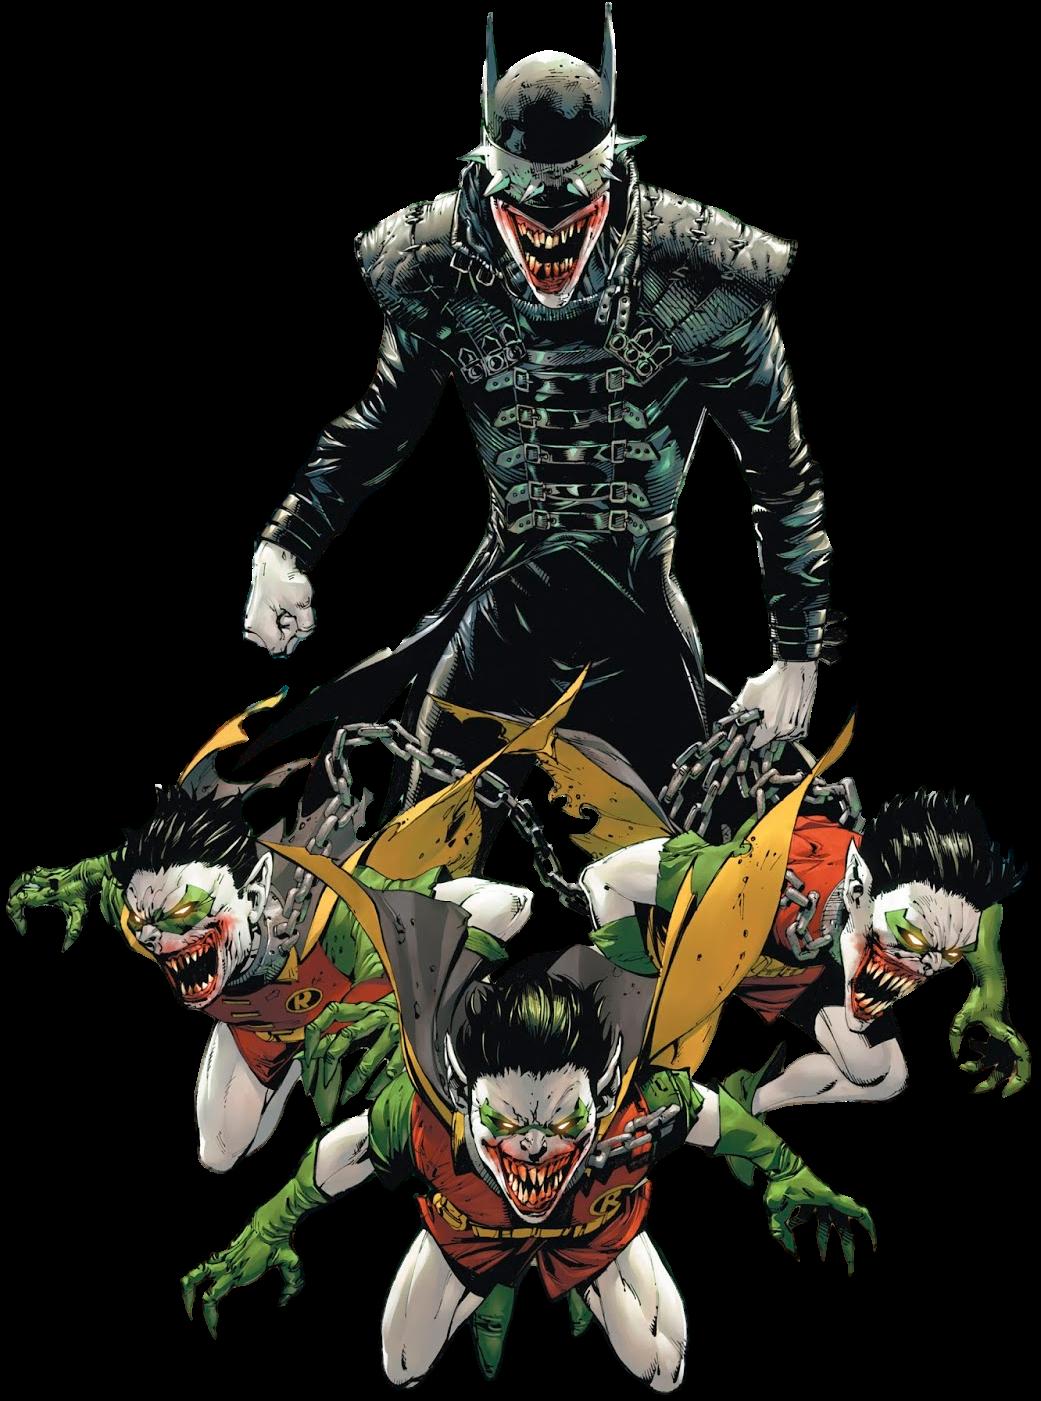 The Batman Who Laughs Villains Wiki FANDOM powered by